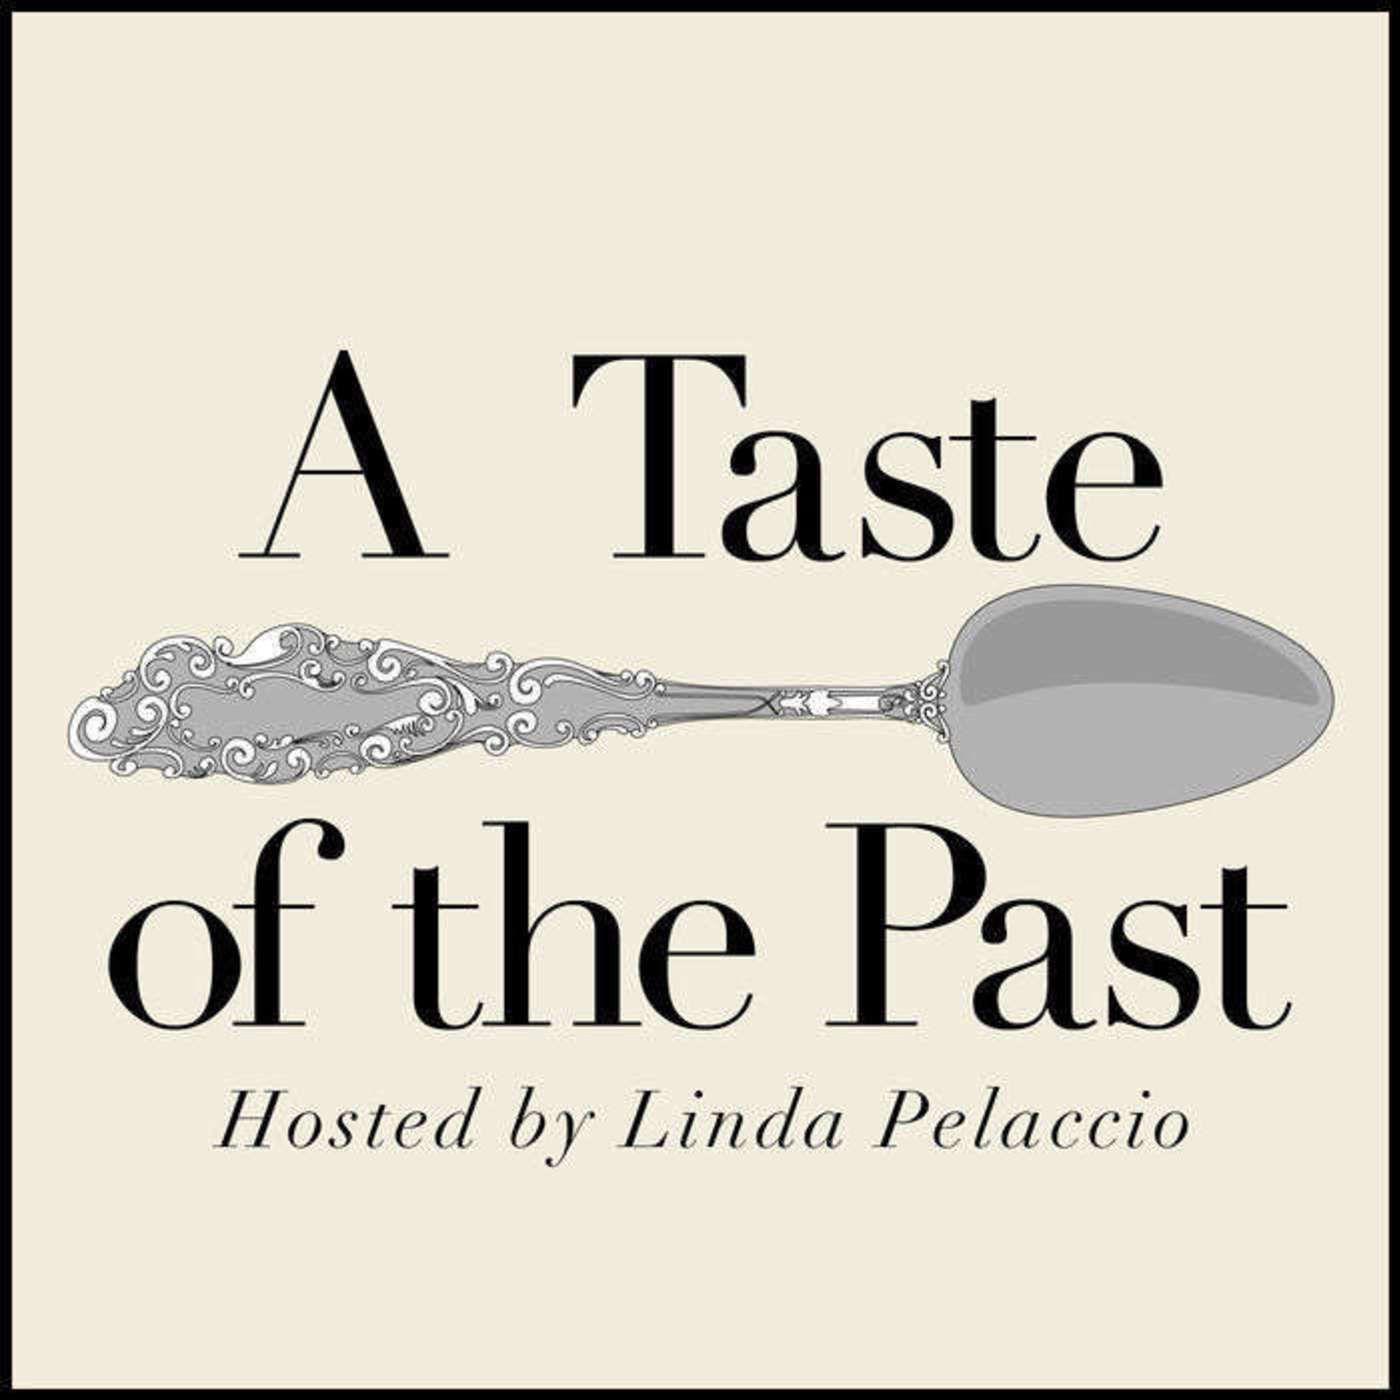 Episode 144: Breakfast History